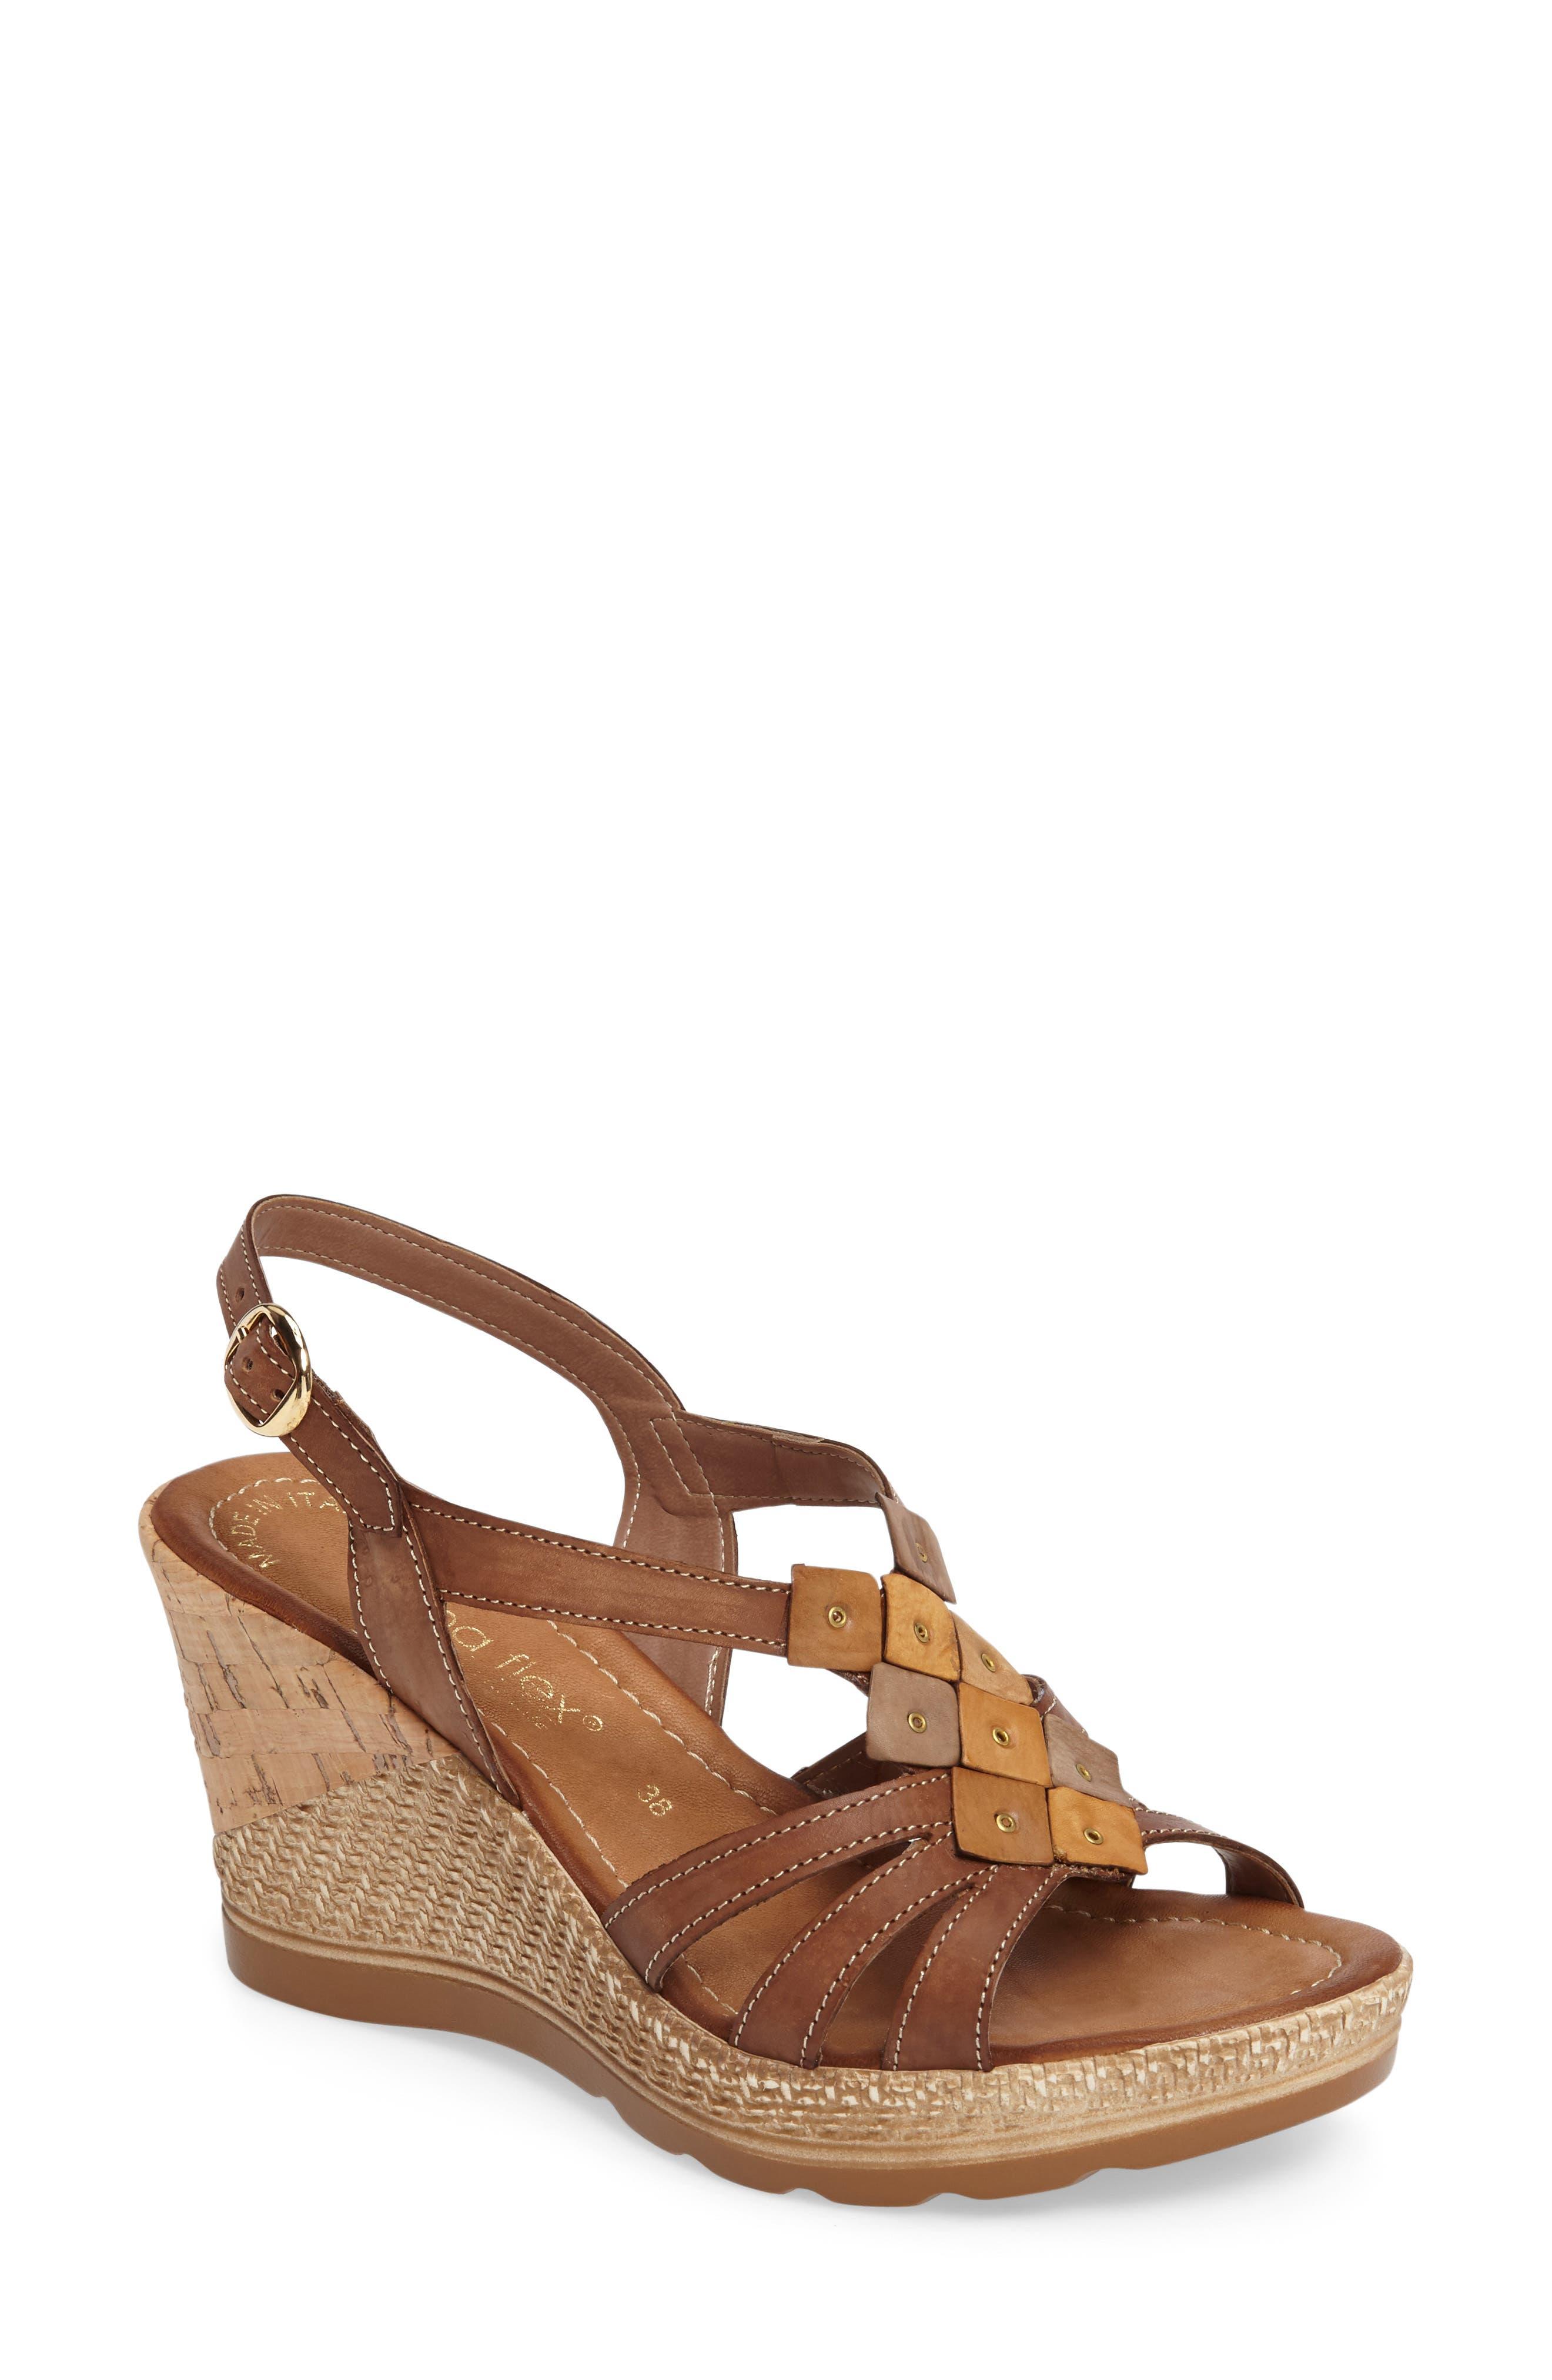 NAPA FLEX Bari Wedge Sandal